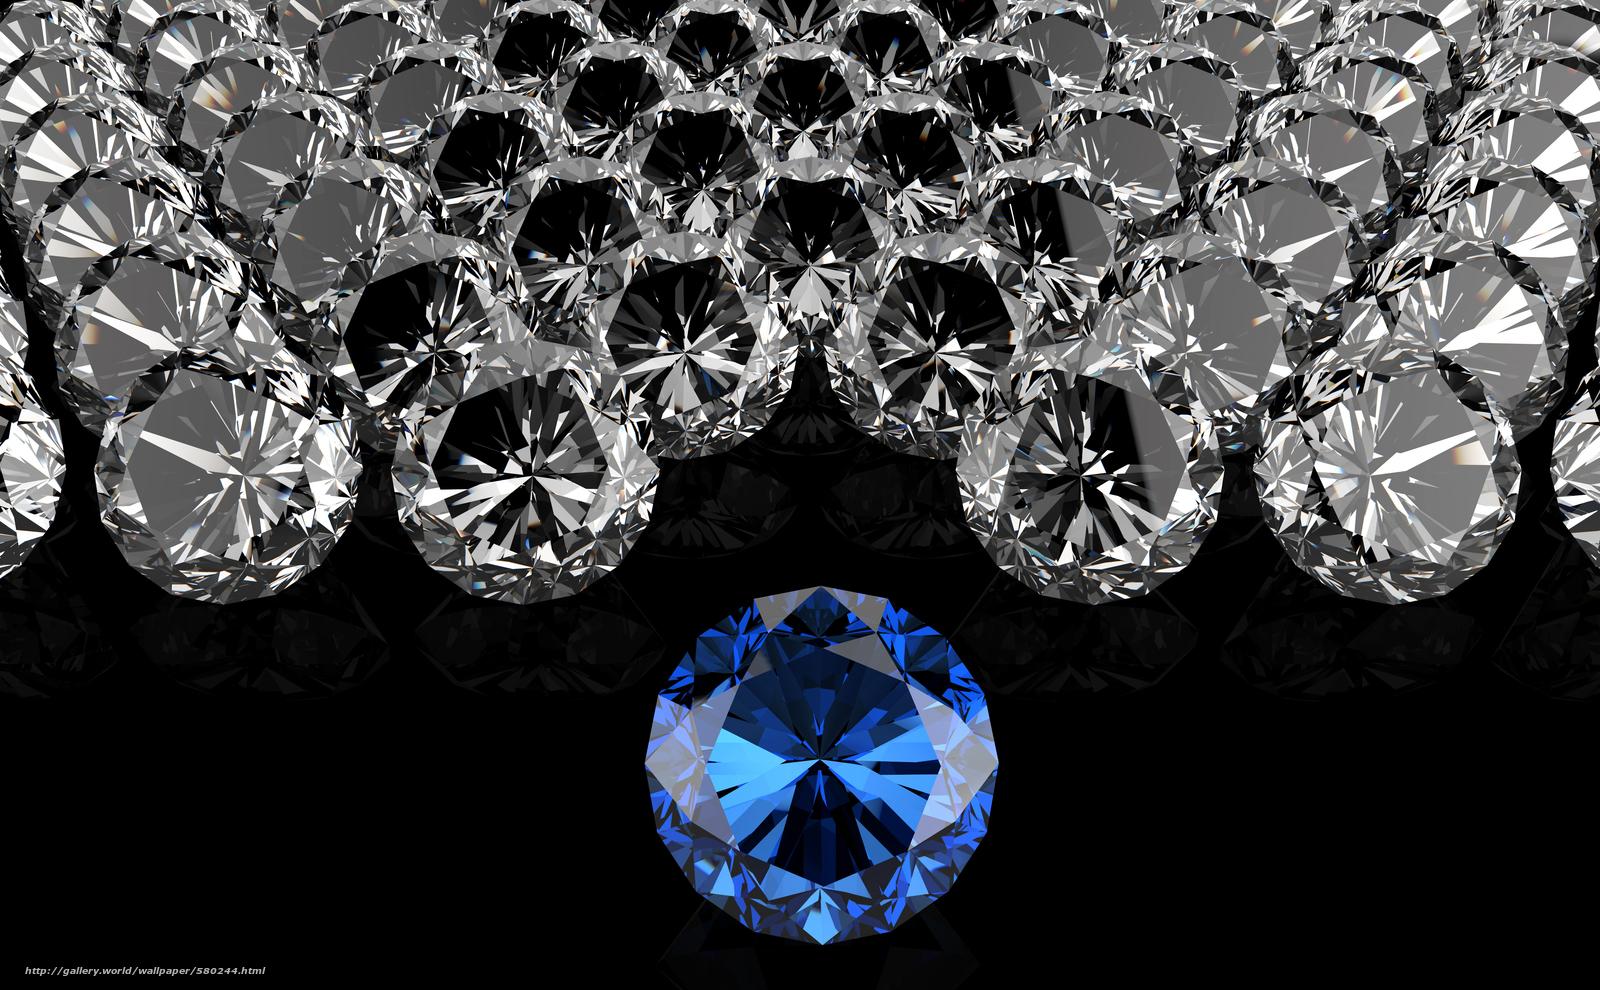 DIAMOND Pebbles Diamonds black background desktop wallpaper 1600x990